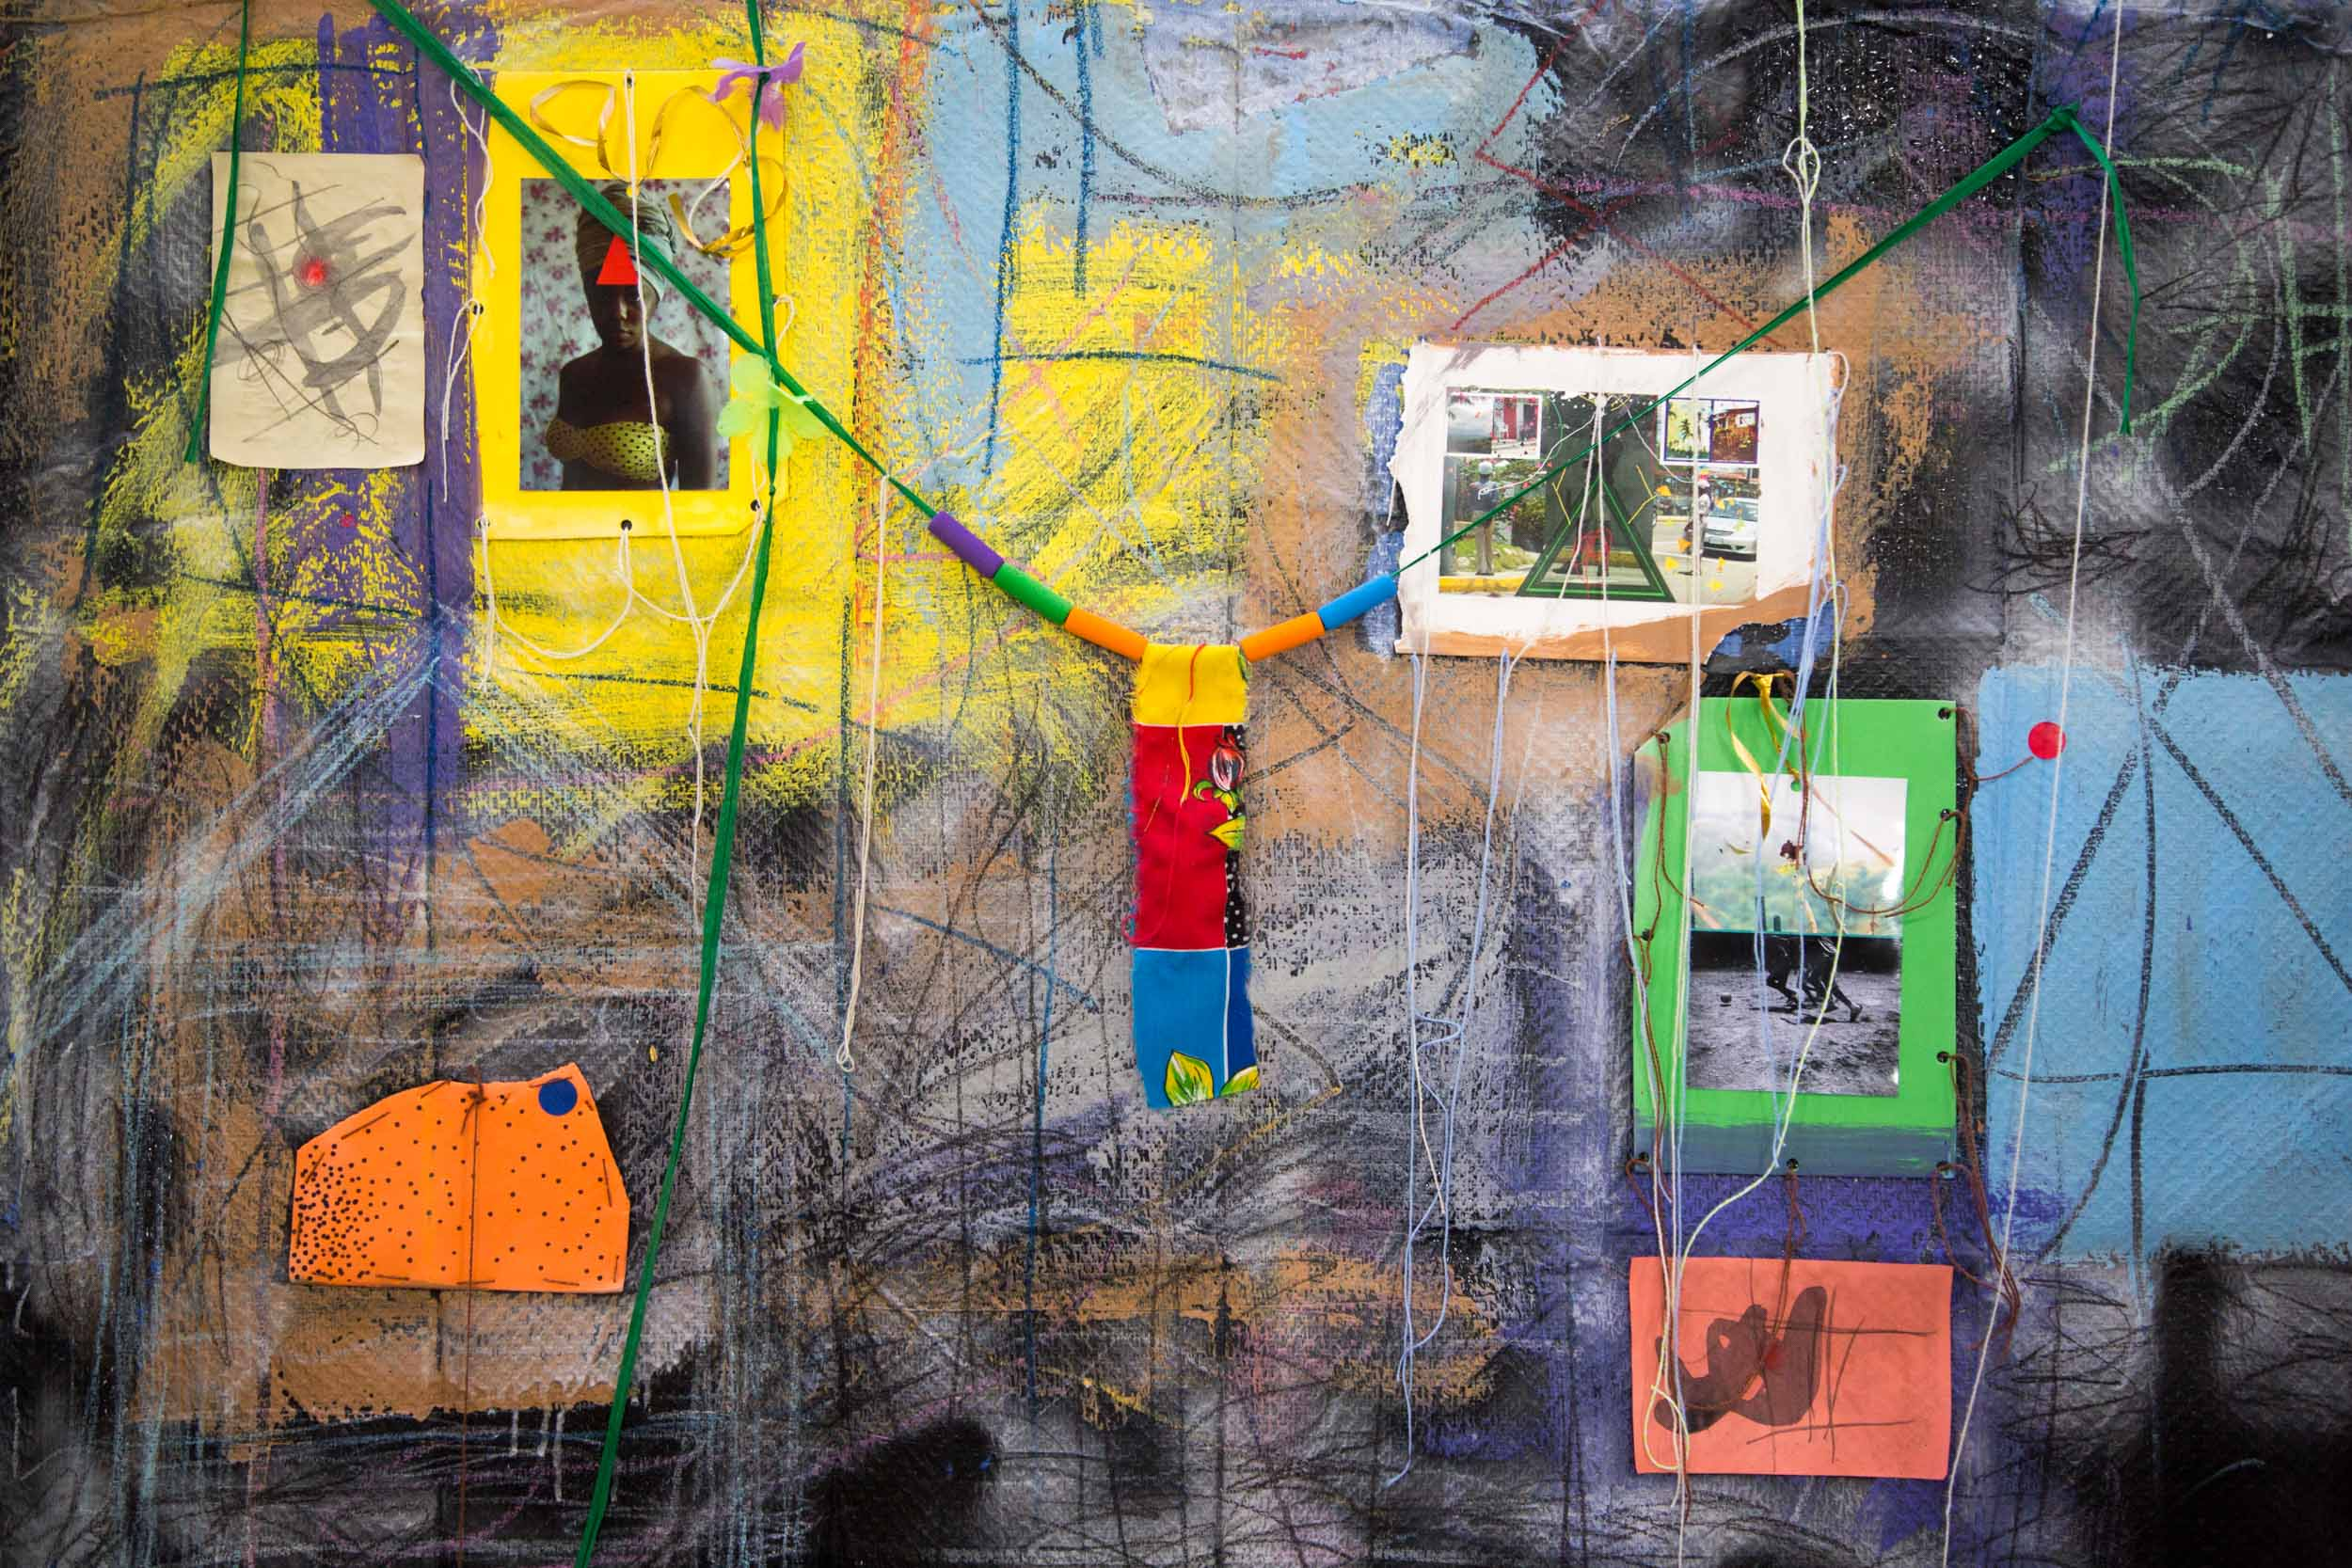 wassaic-project-artist-kwesi-abbensetts-2018-09-13-11-28-06.jpg